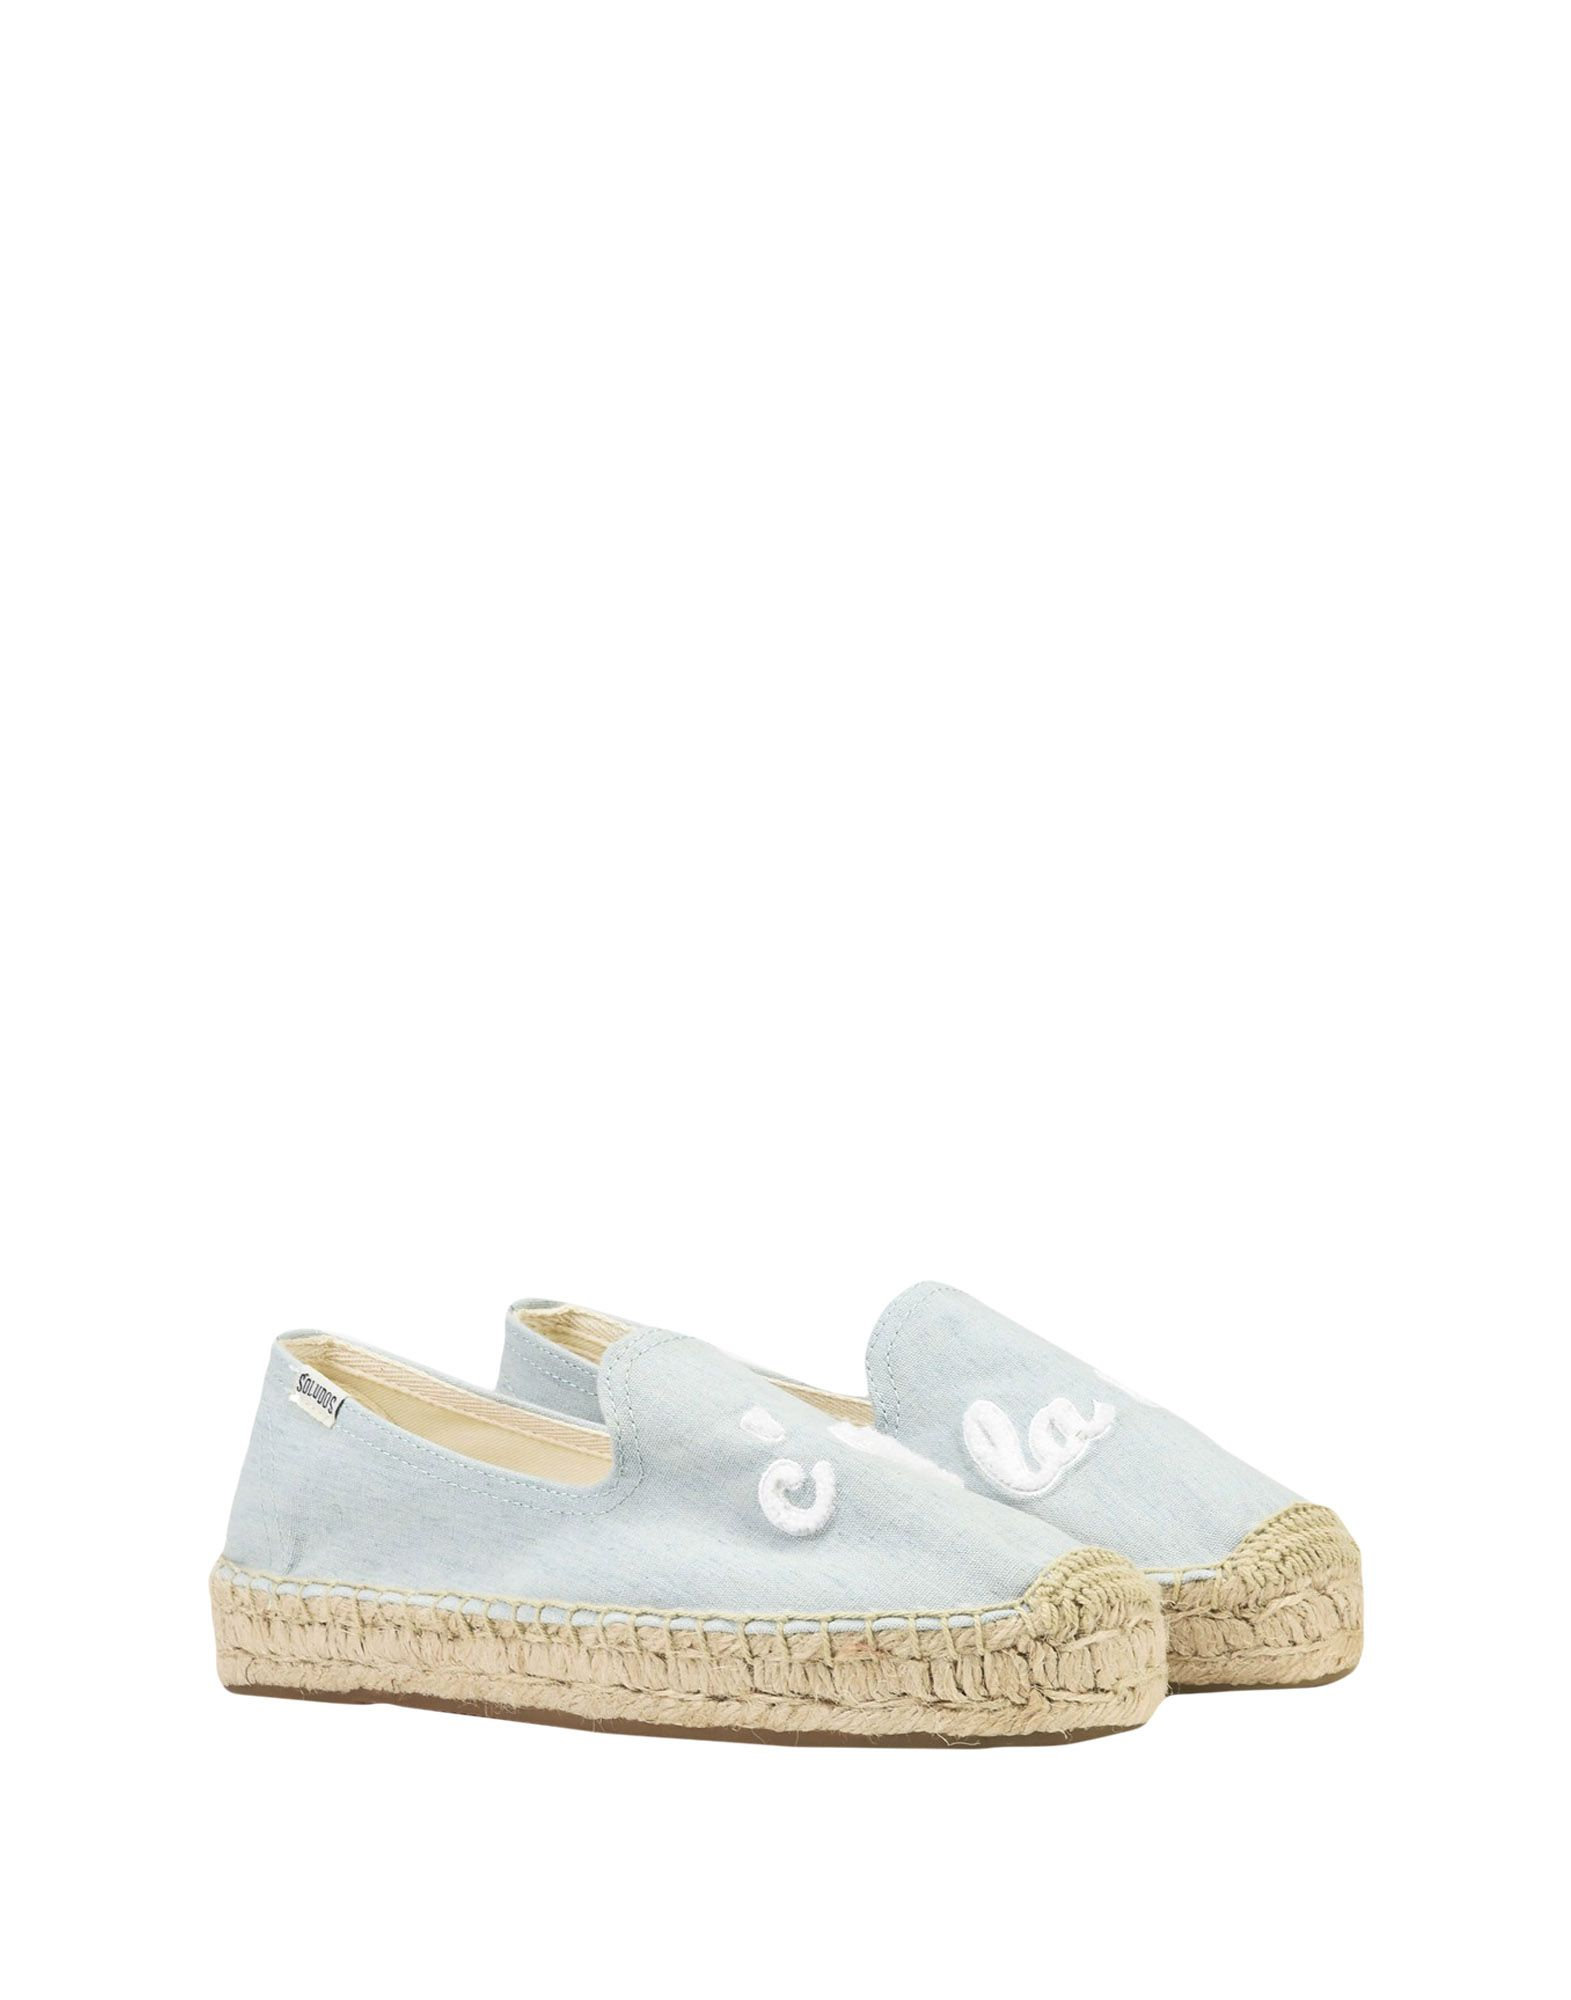 Soludos C'est C'est C'est La Vie Smocking Slipper  11477860SD Gute Qualität beliebte Schuhe cf25f0